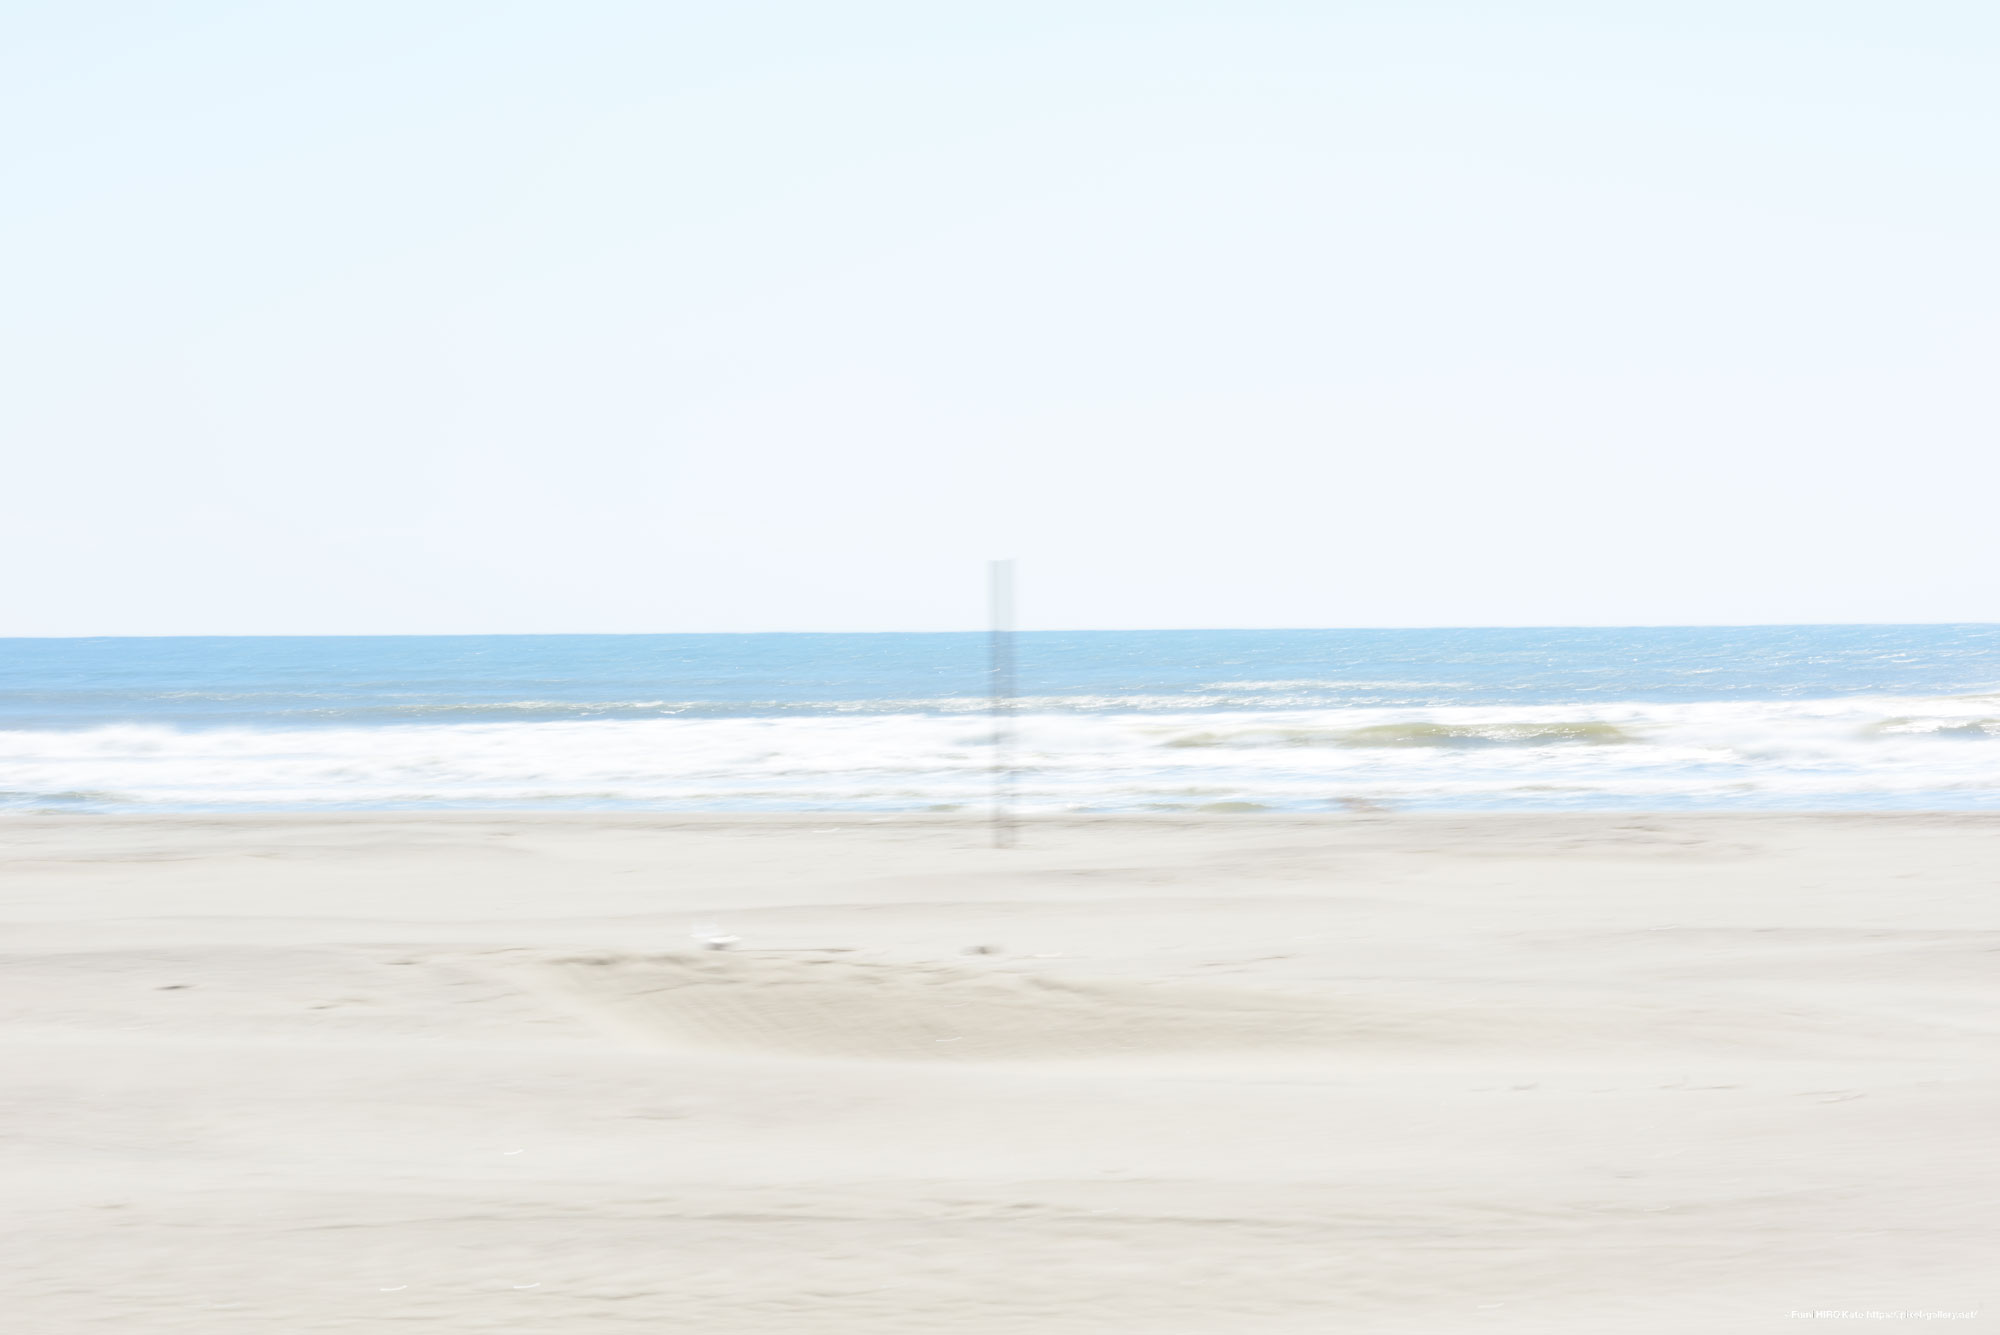 具象を拒絶する海景 19-001